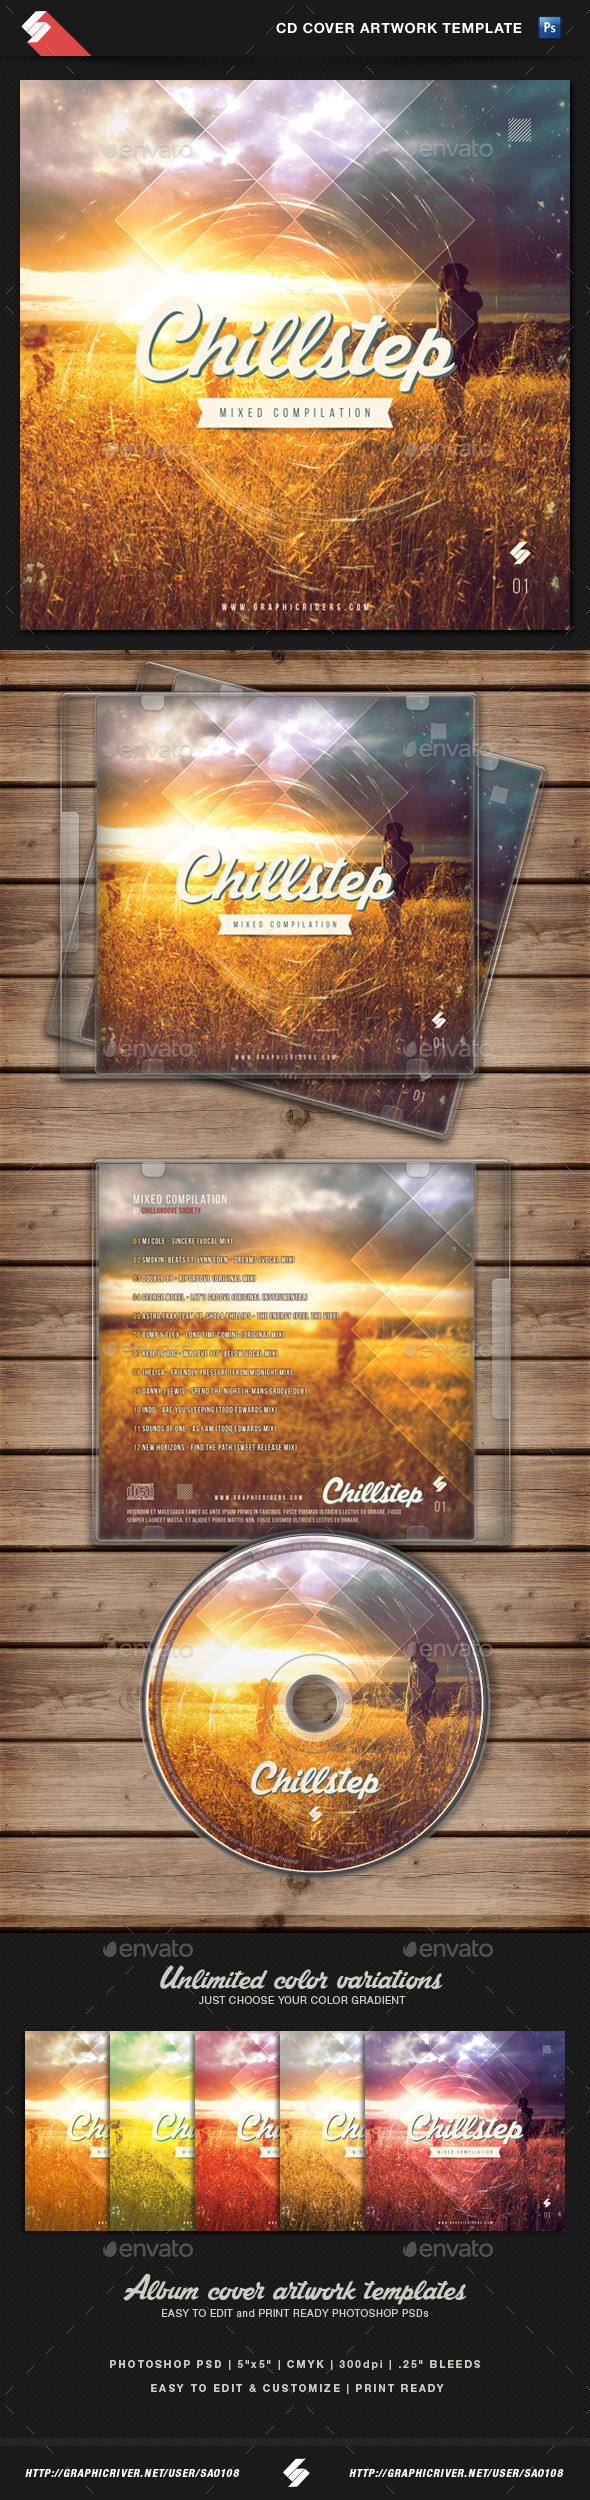 Chillstep - CD Cover Artwork Template - CD & DVD Artwork Print Templates